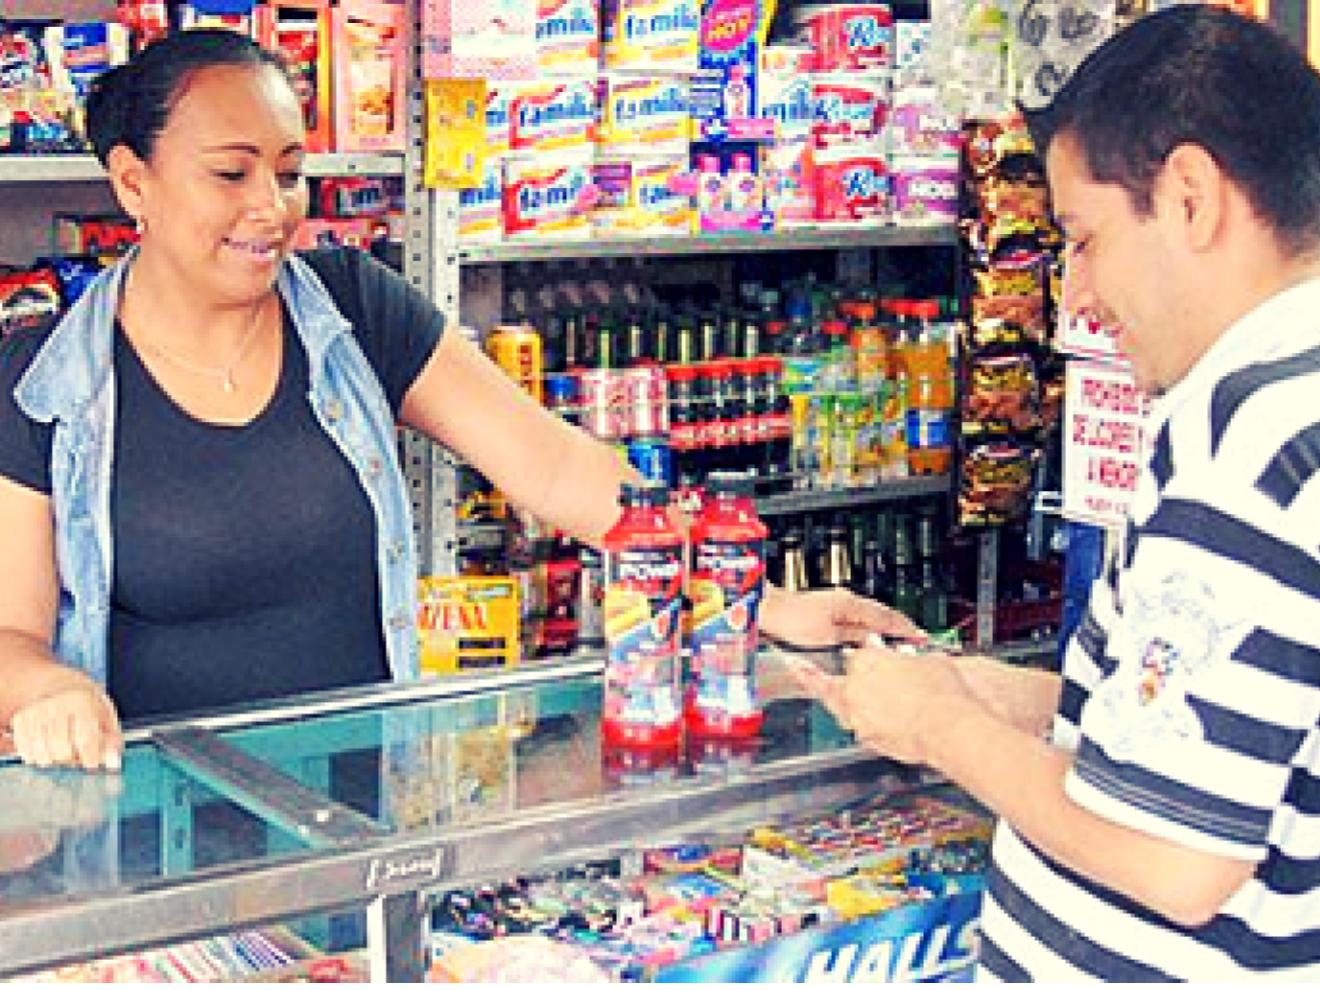 © Photograph by https://anuor.blogspot.com/2018/05/futuro-del-retail-tecnologia-en-las.html